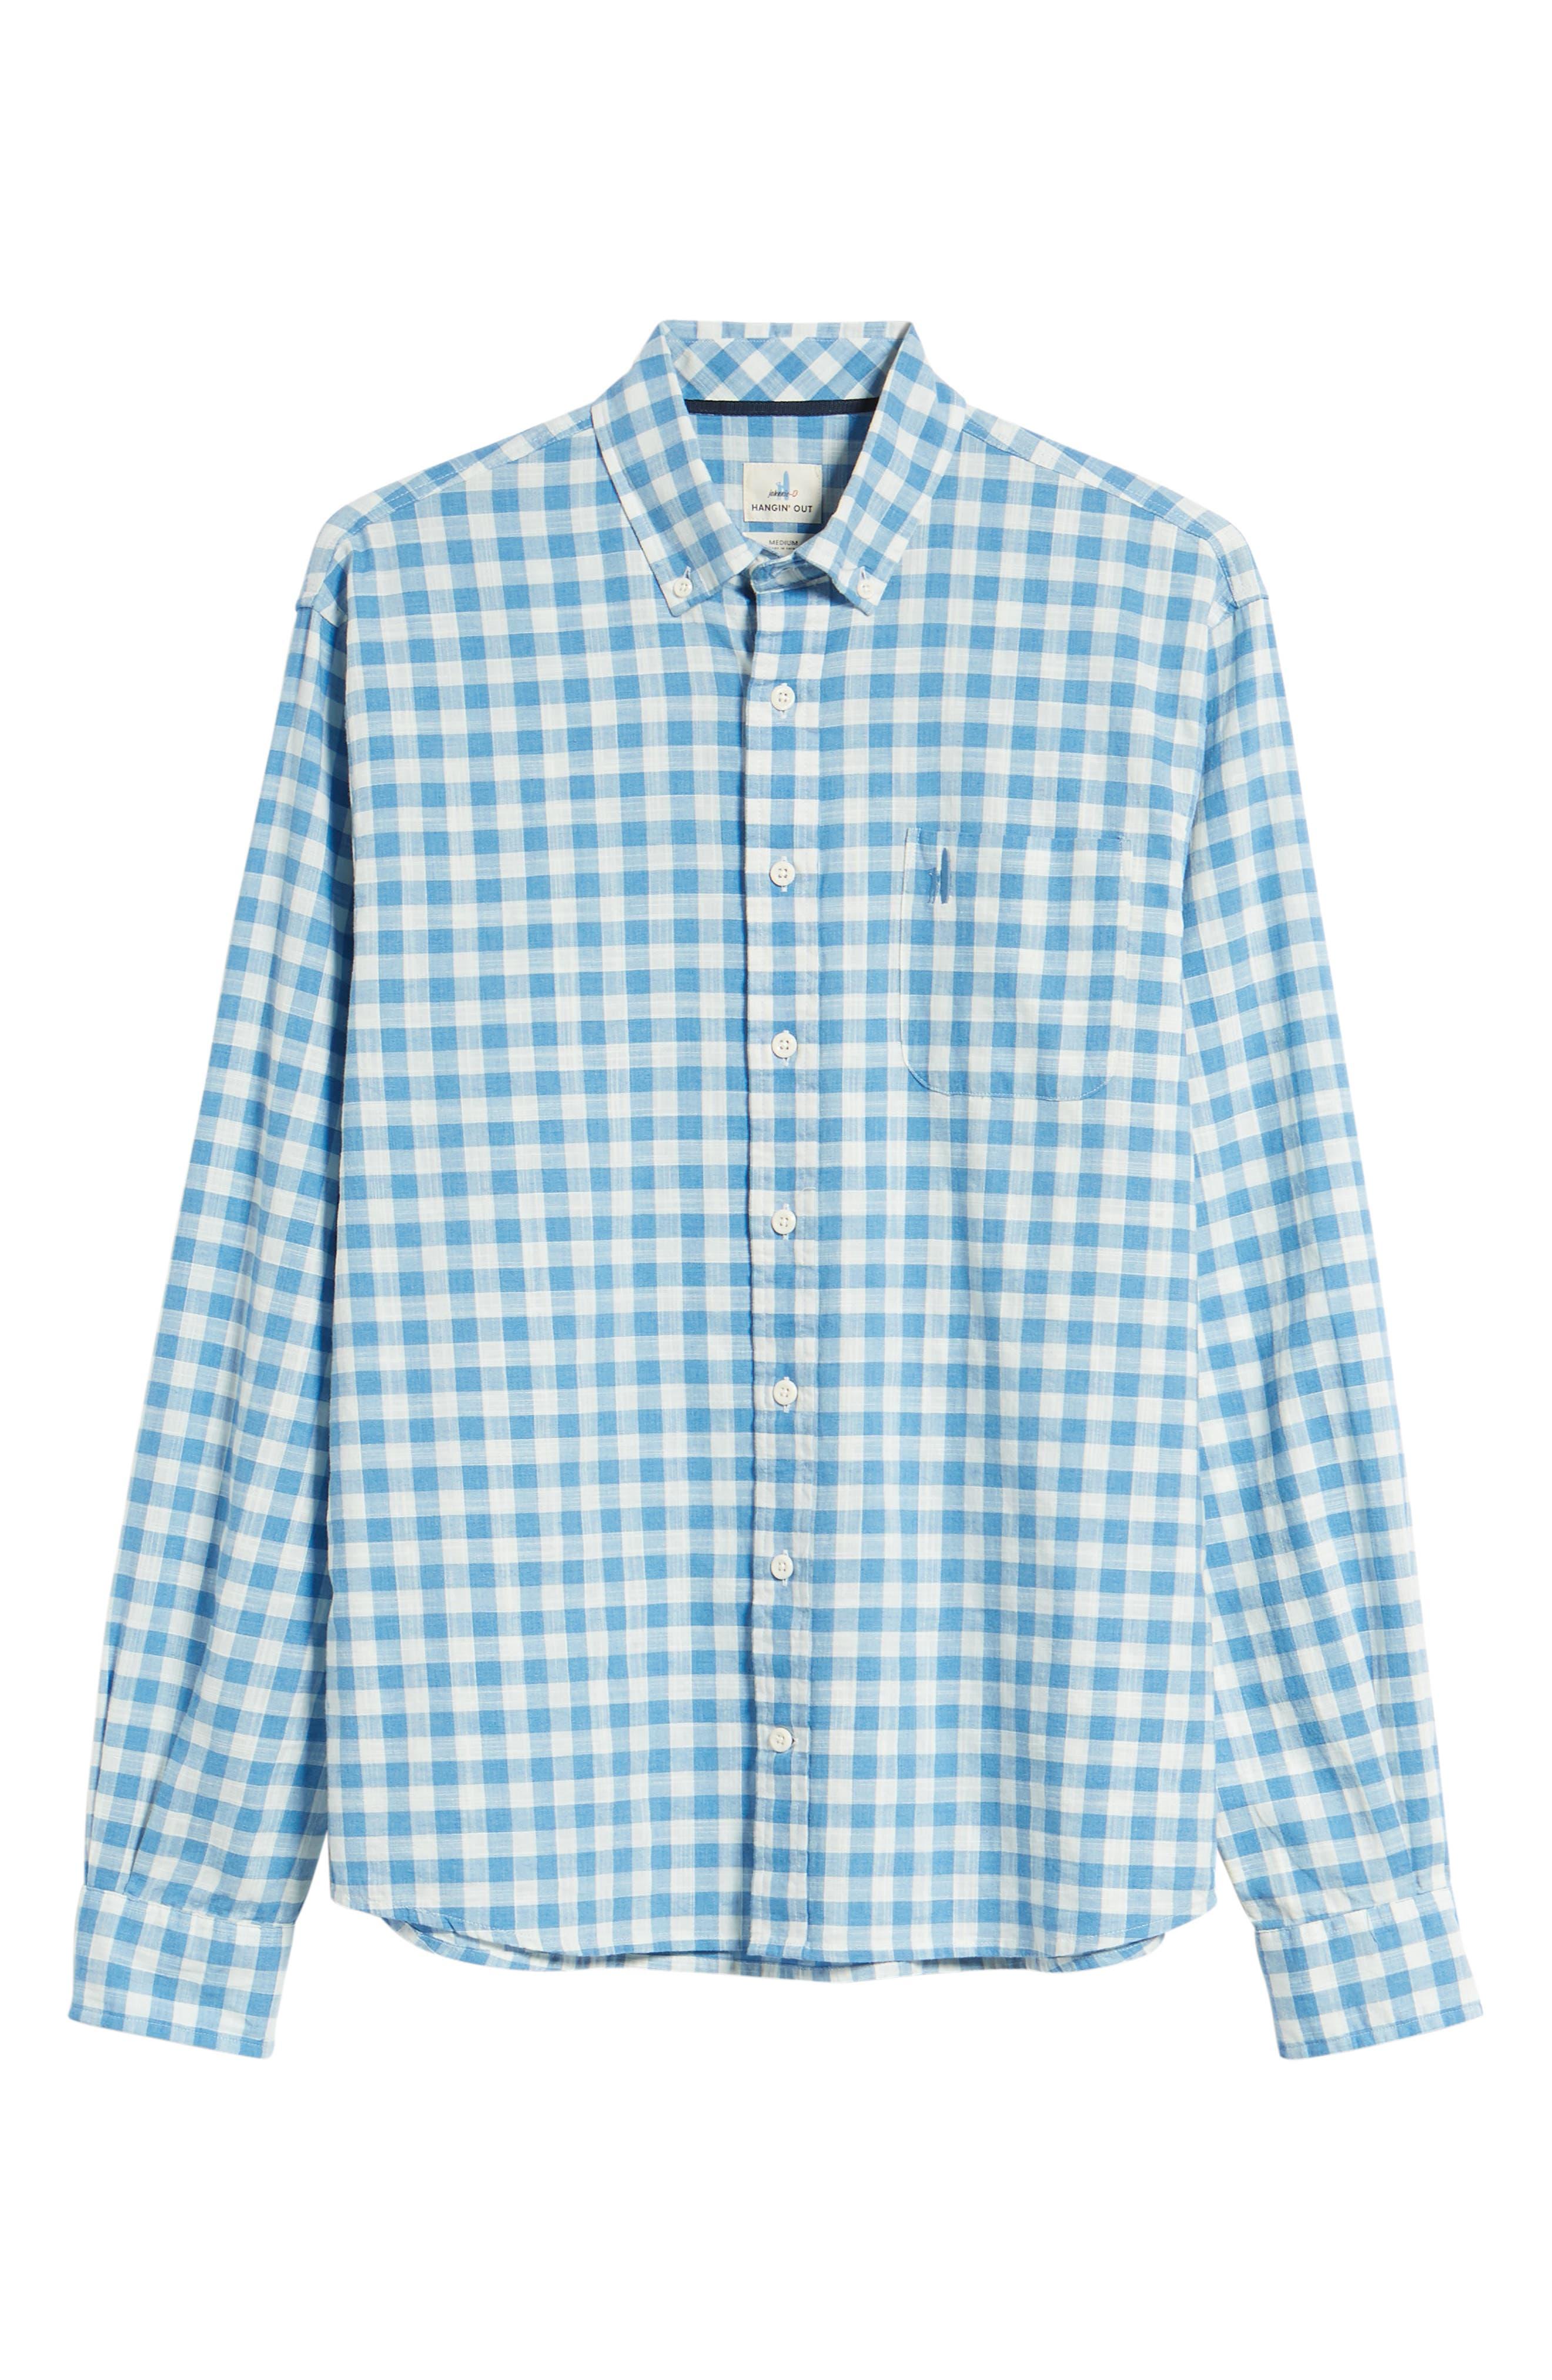 Watts Regular Fit Sport Shirt,                             Alternate thumbnail 6, color,                             200